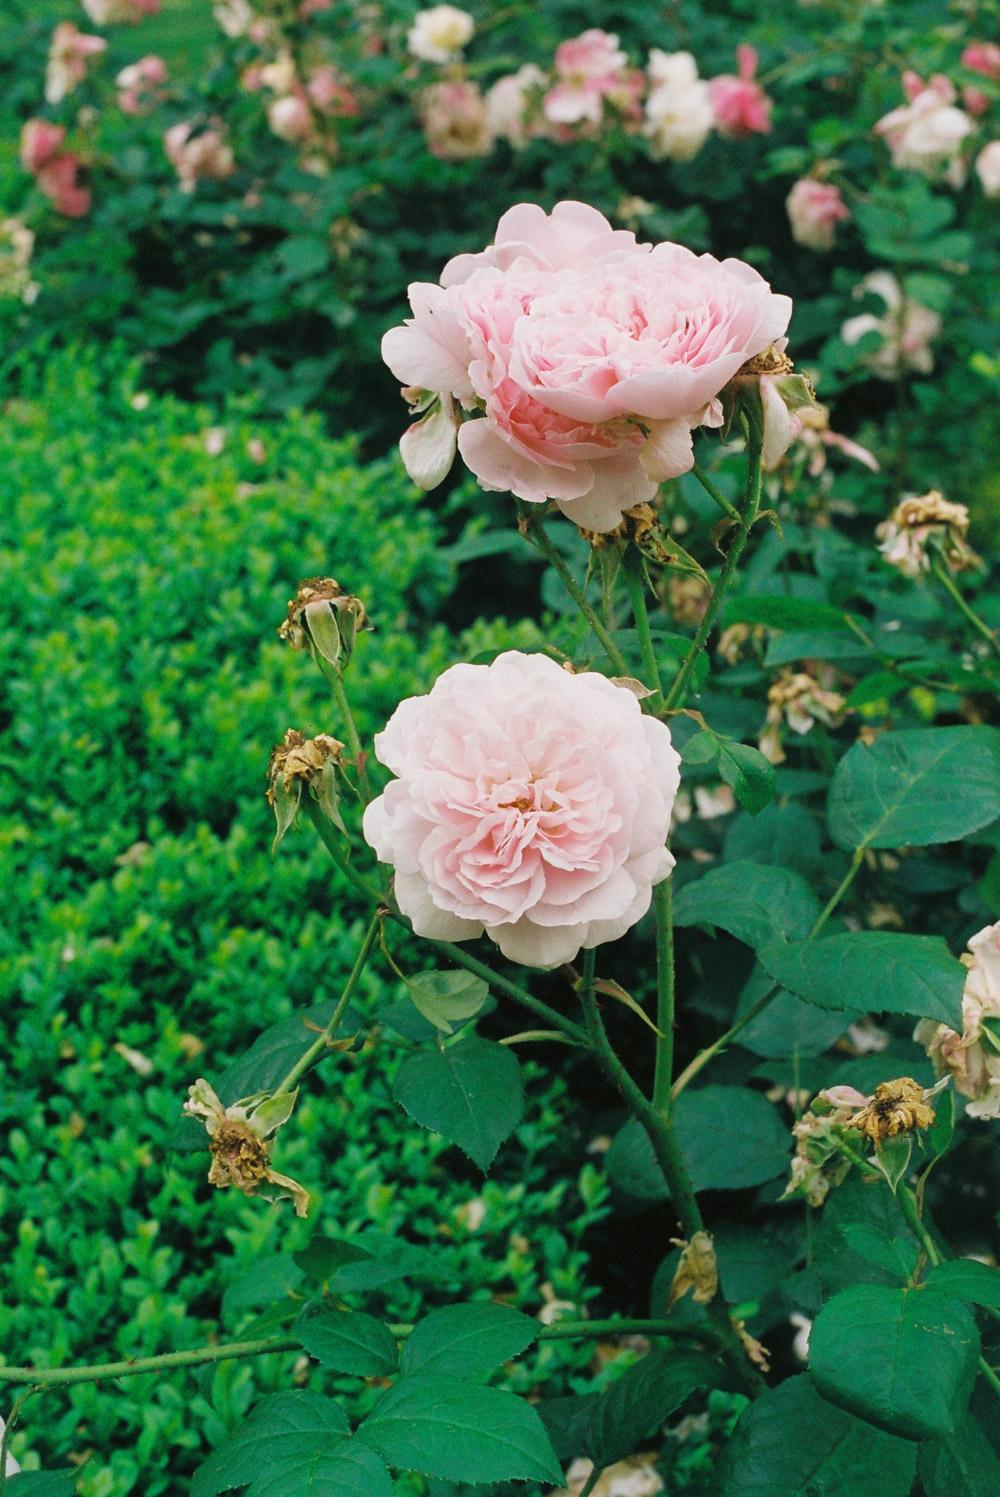 MonicaRGoya-Gardens-13.jpg